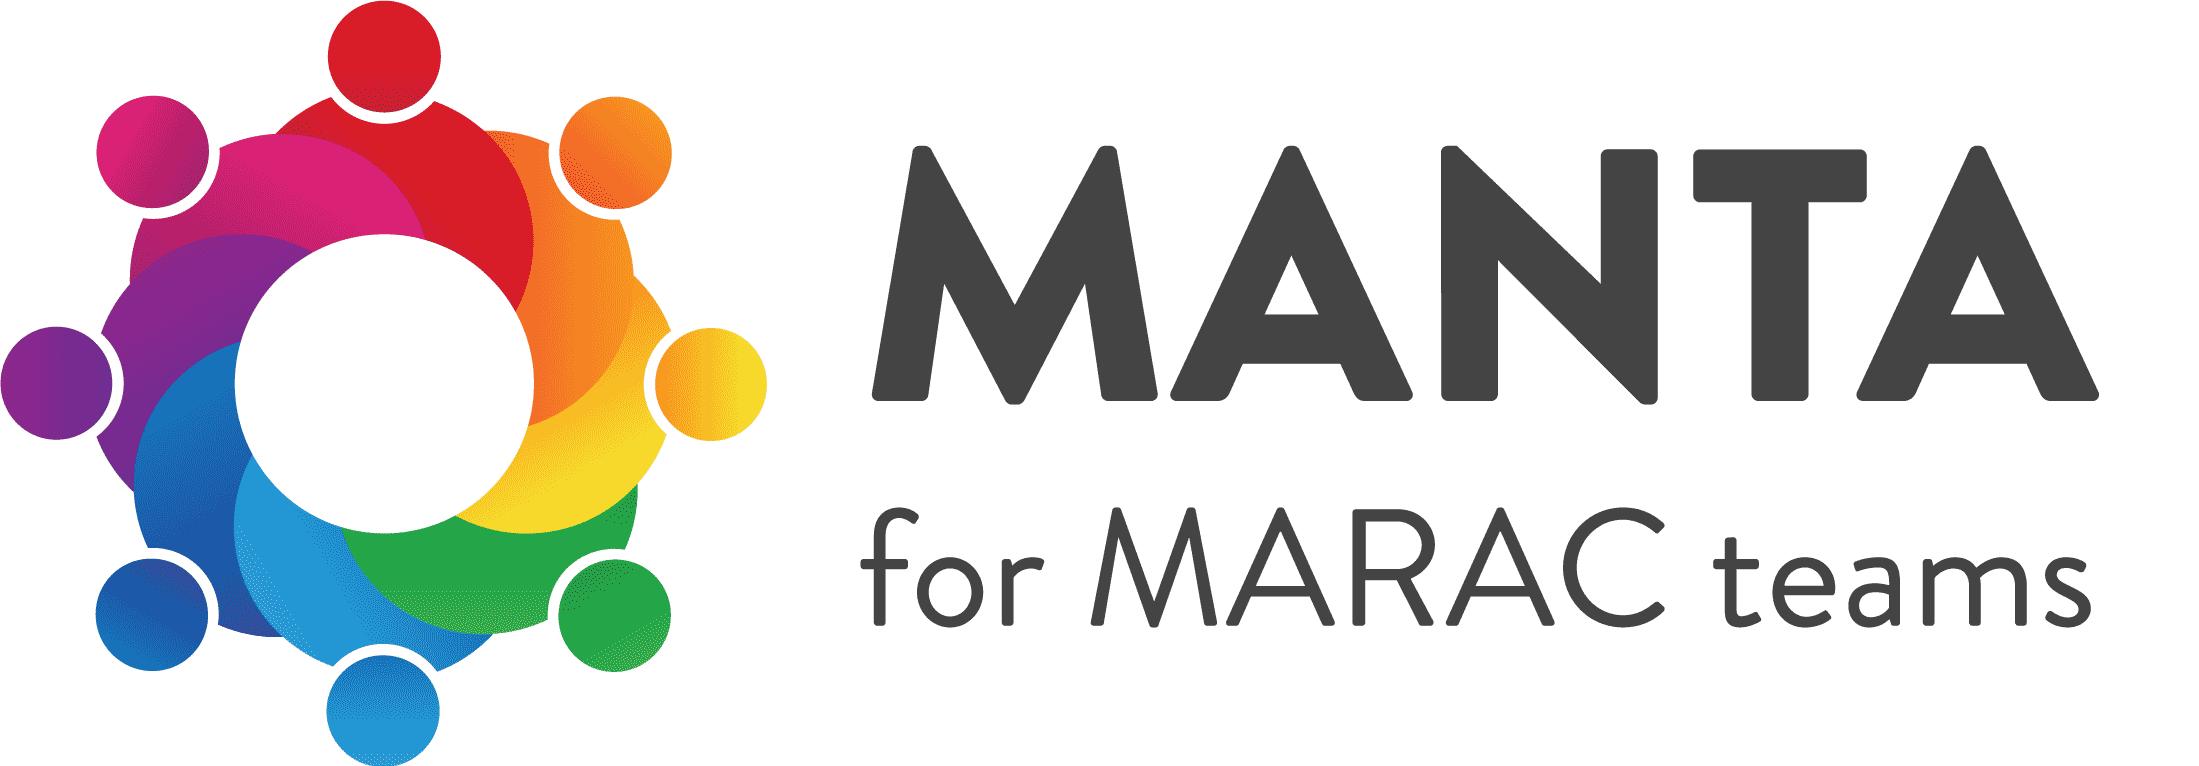 MARAC 24 - Powered by Halo